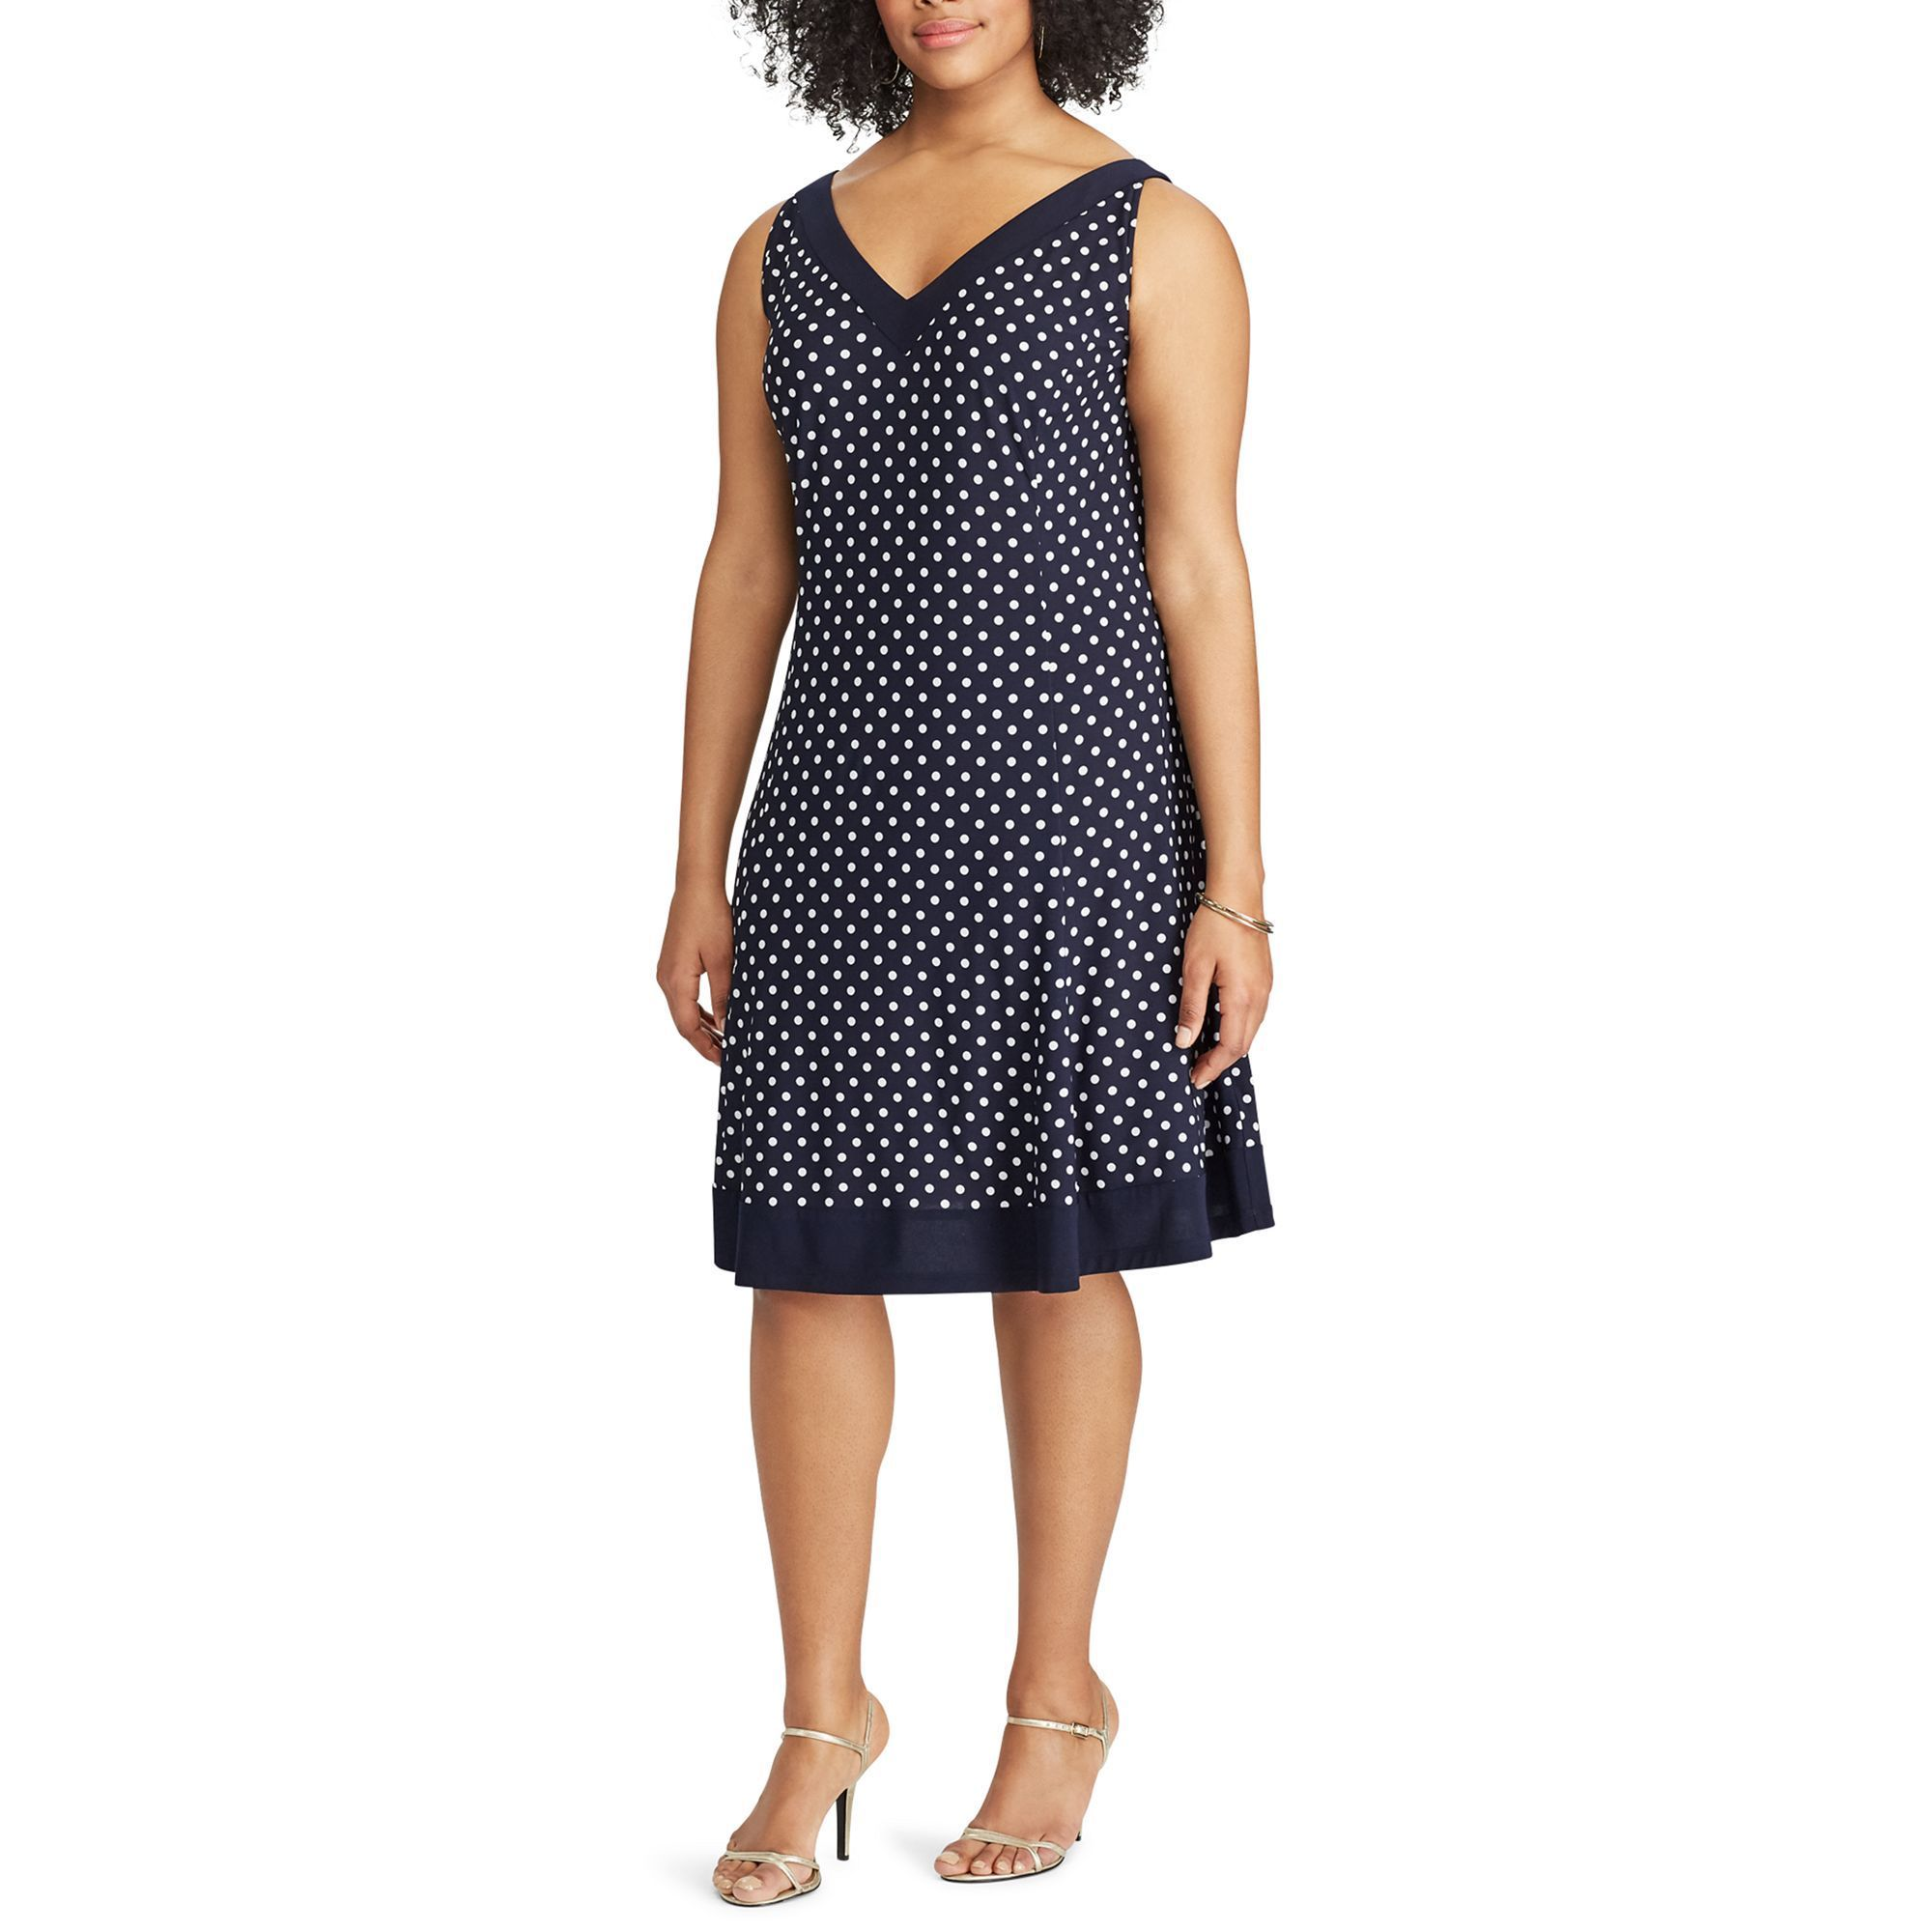 Plus Size Chaps Polka-Dot Fit & Flare Dress, Women's, Size: 20